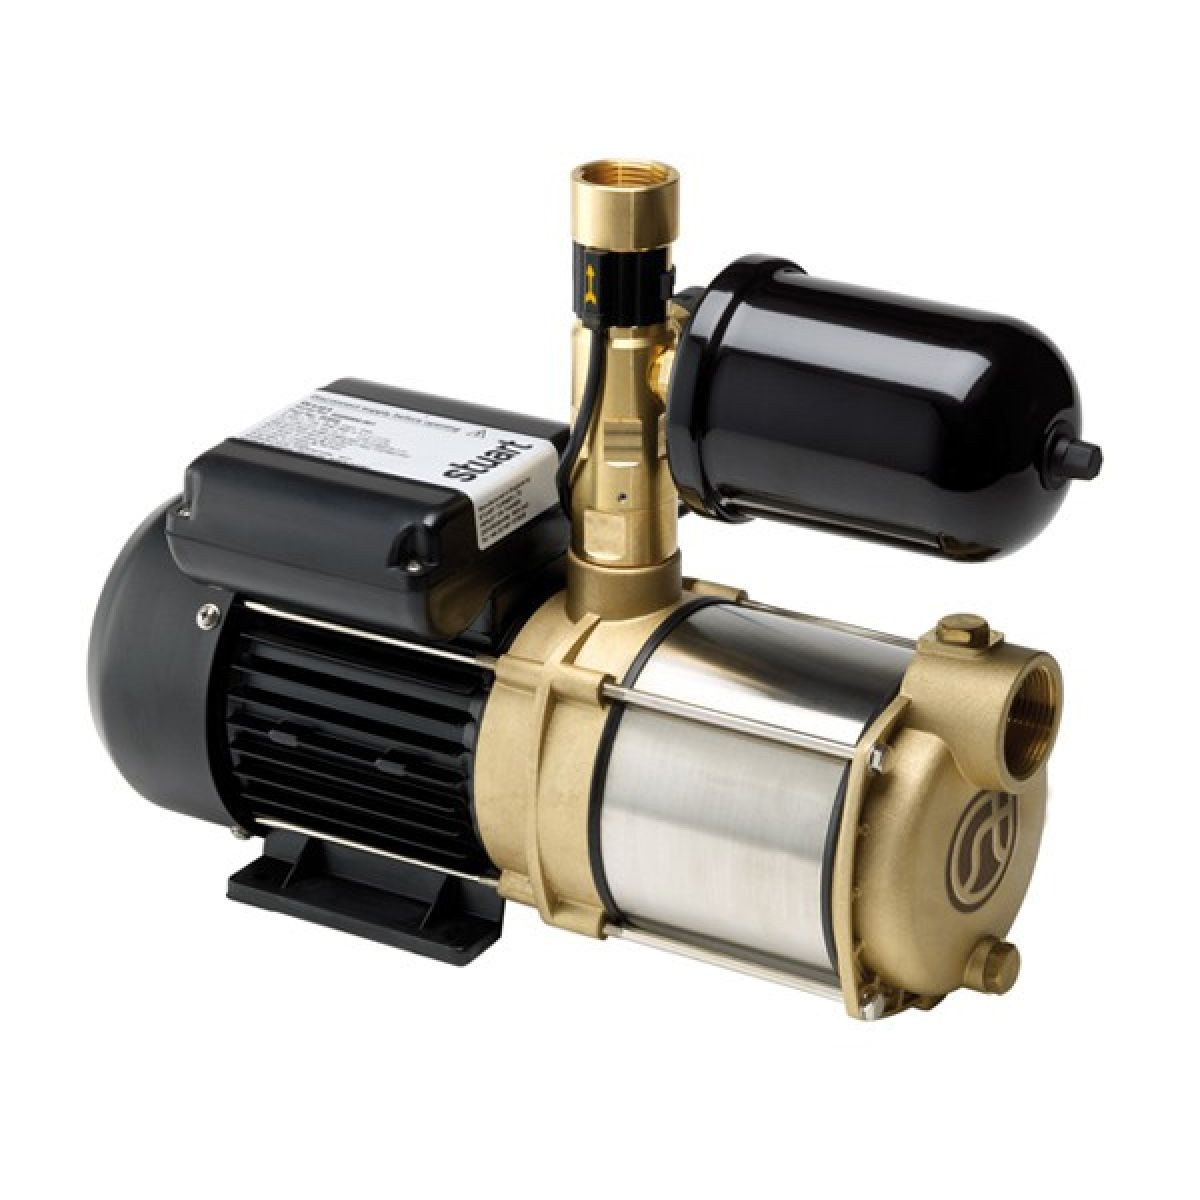 Stuart Turner 46610 CH 4-60 B Boostamatic Multistage 6.0 Bar Pump